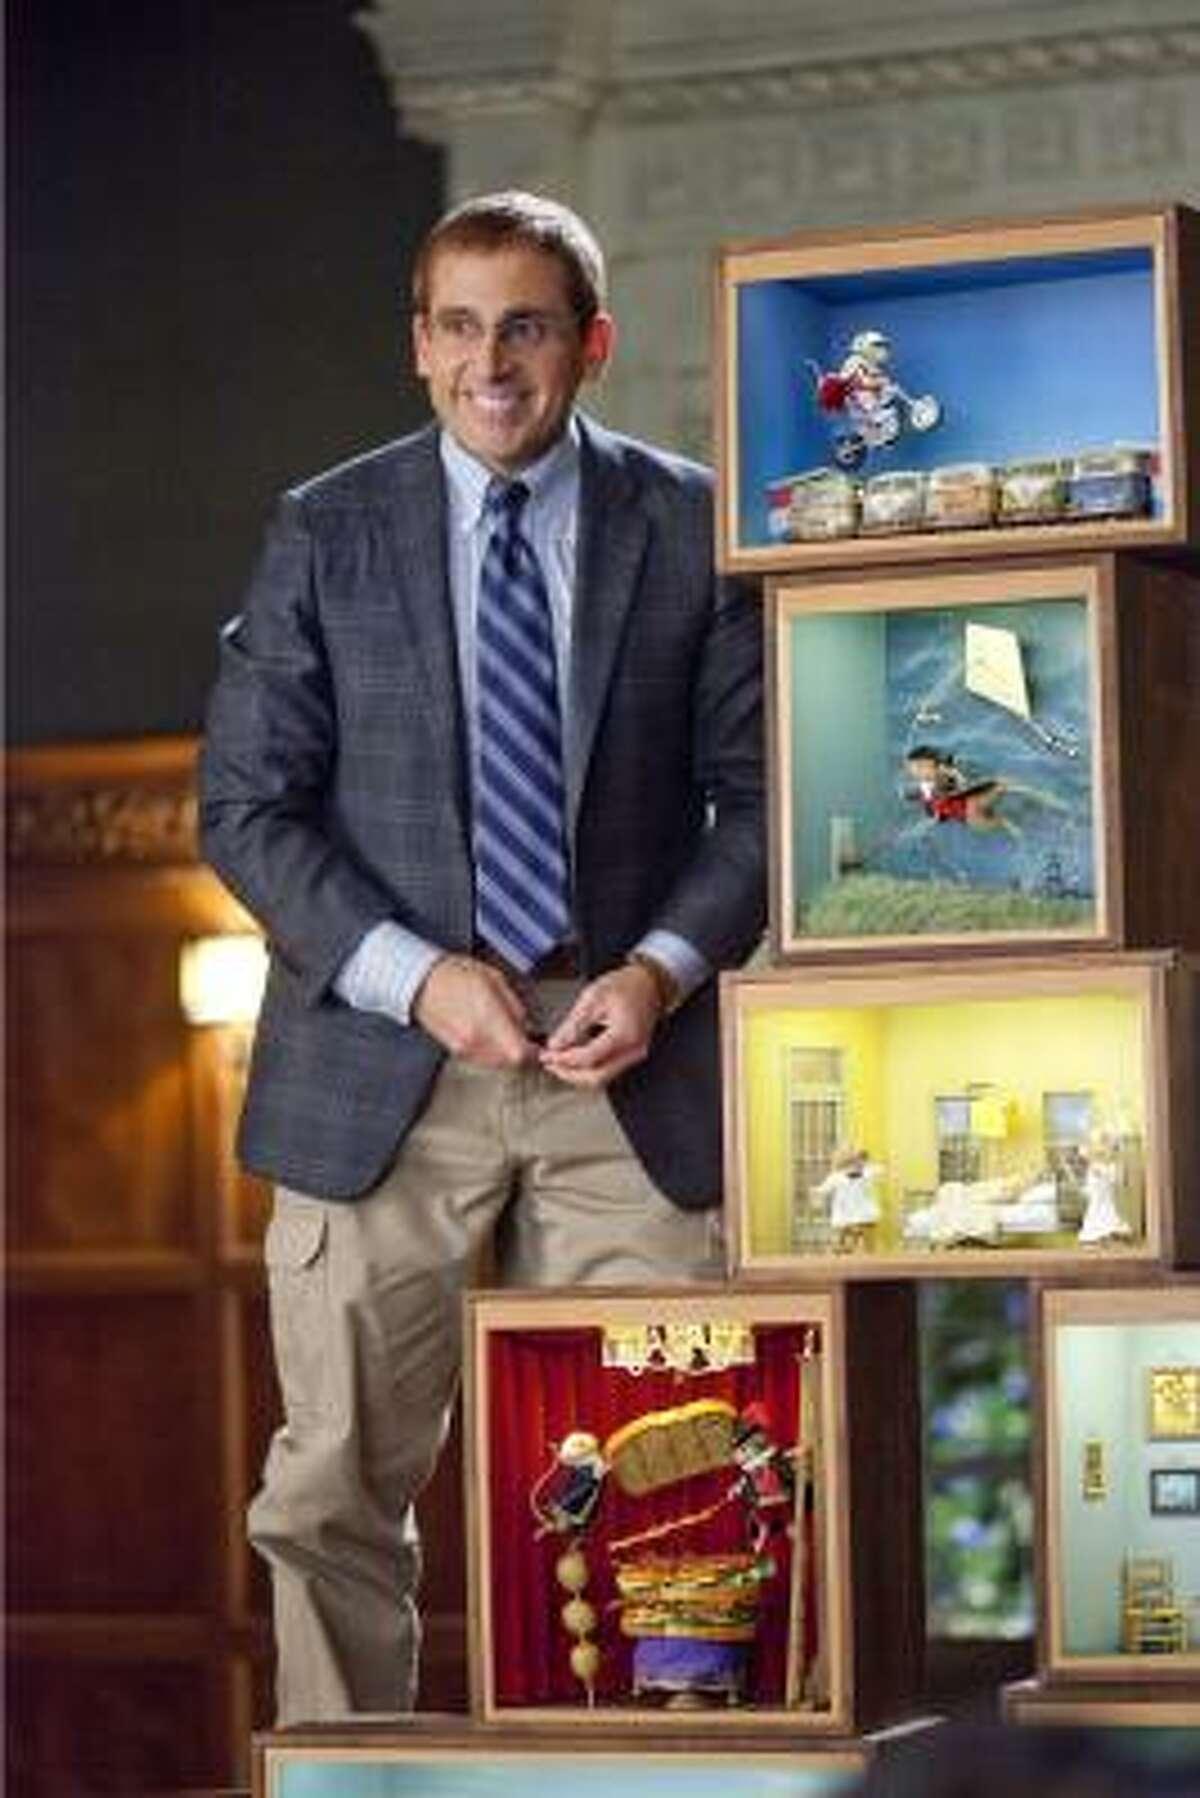 Dinner for Schmucks, $6.3 million: A rising executive